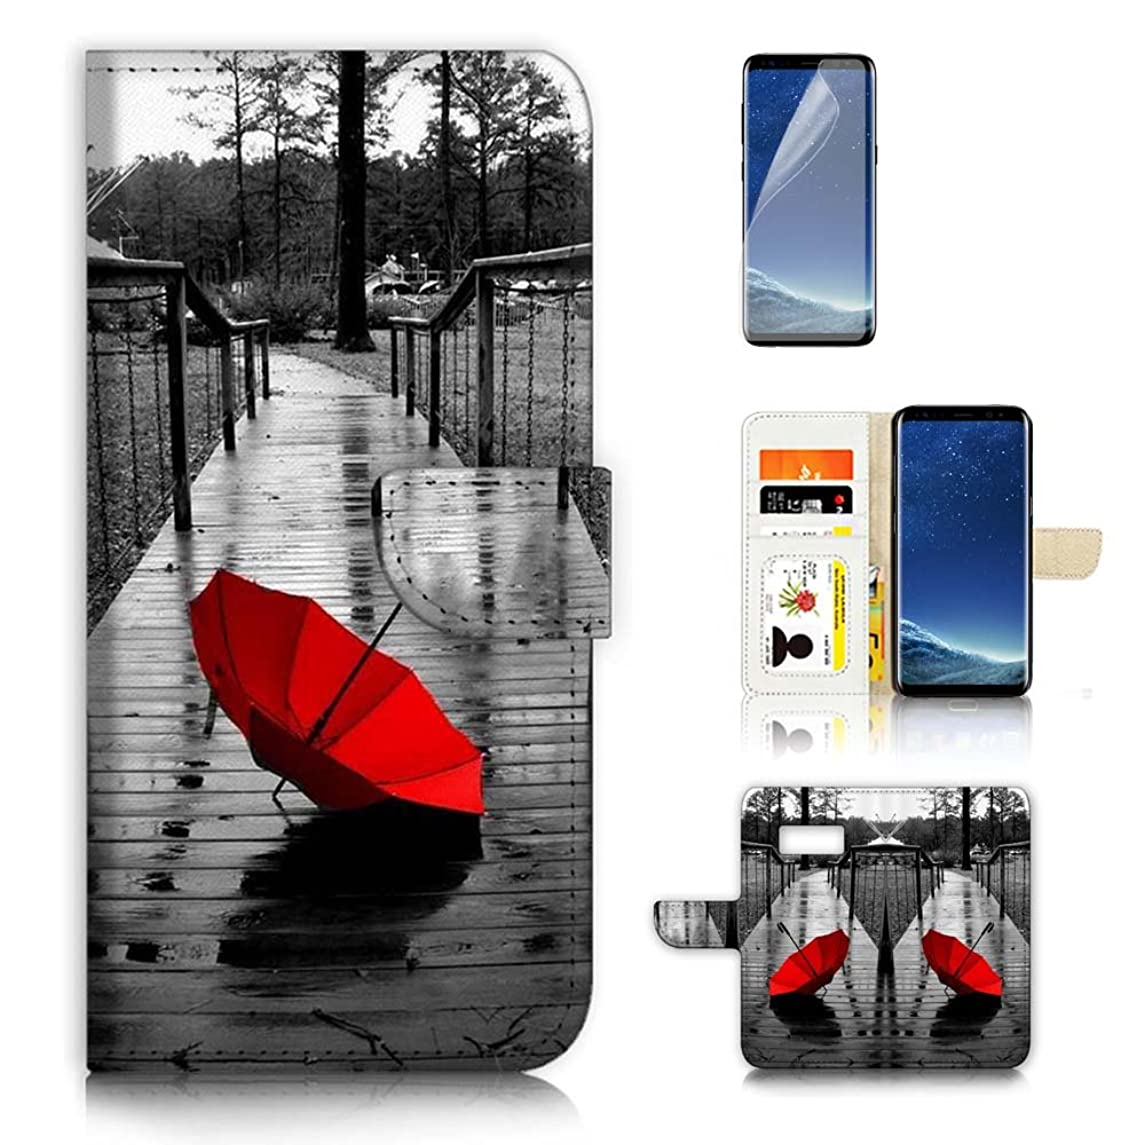 ( For Samsung S8 , Galaxy S8 ) Flip Wallet Case Cover & Screen Protector Bundle - A20112 Red Umbrella